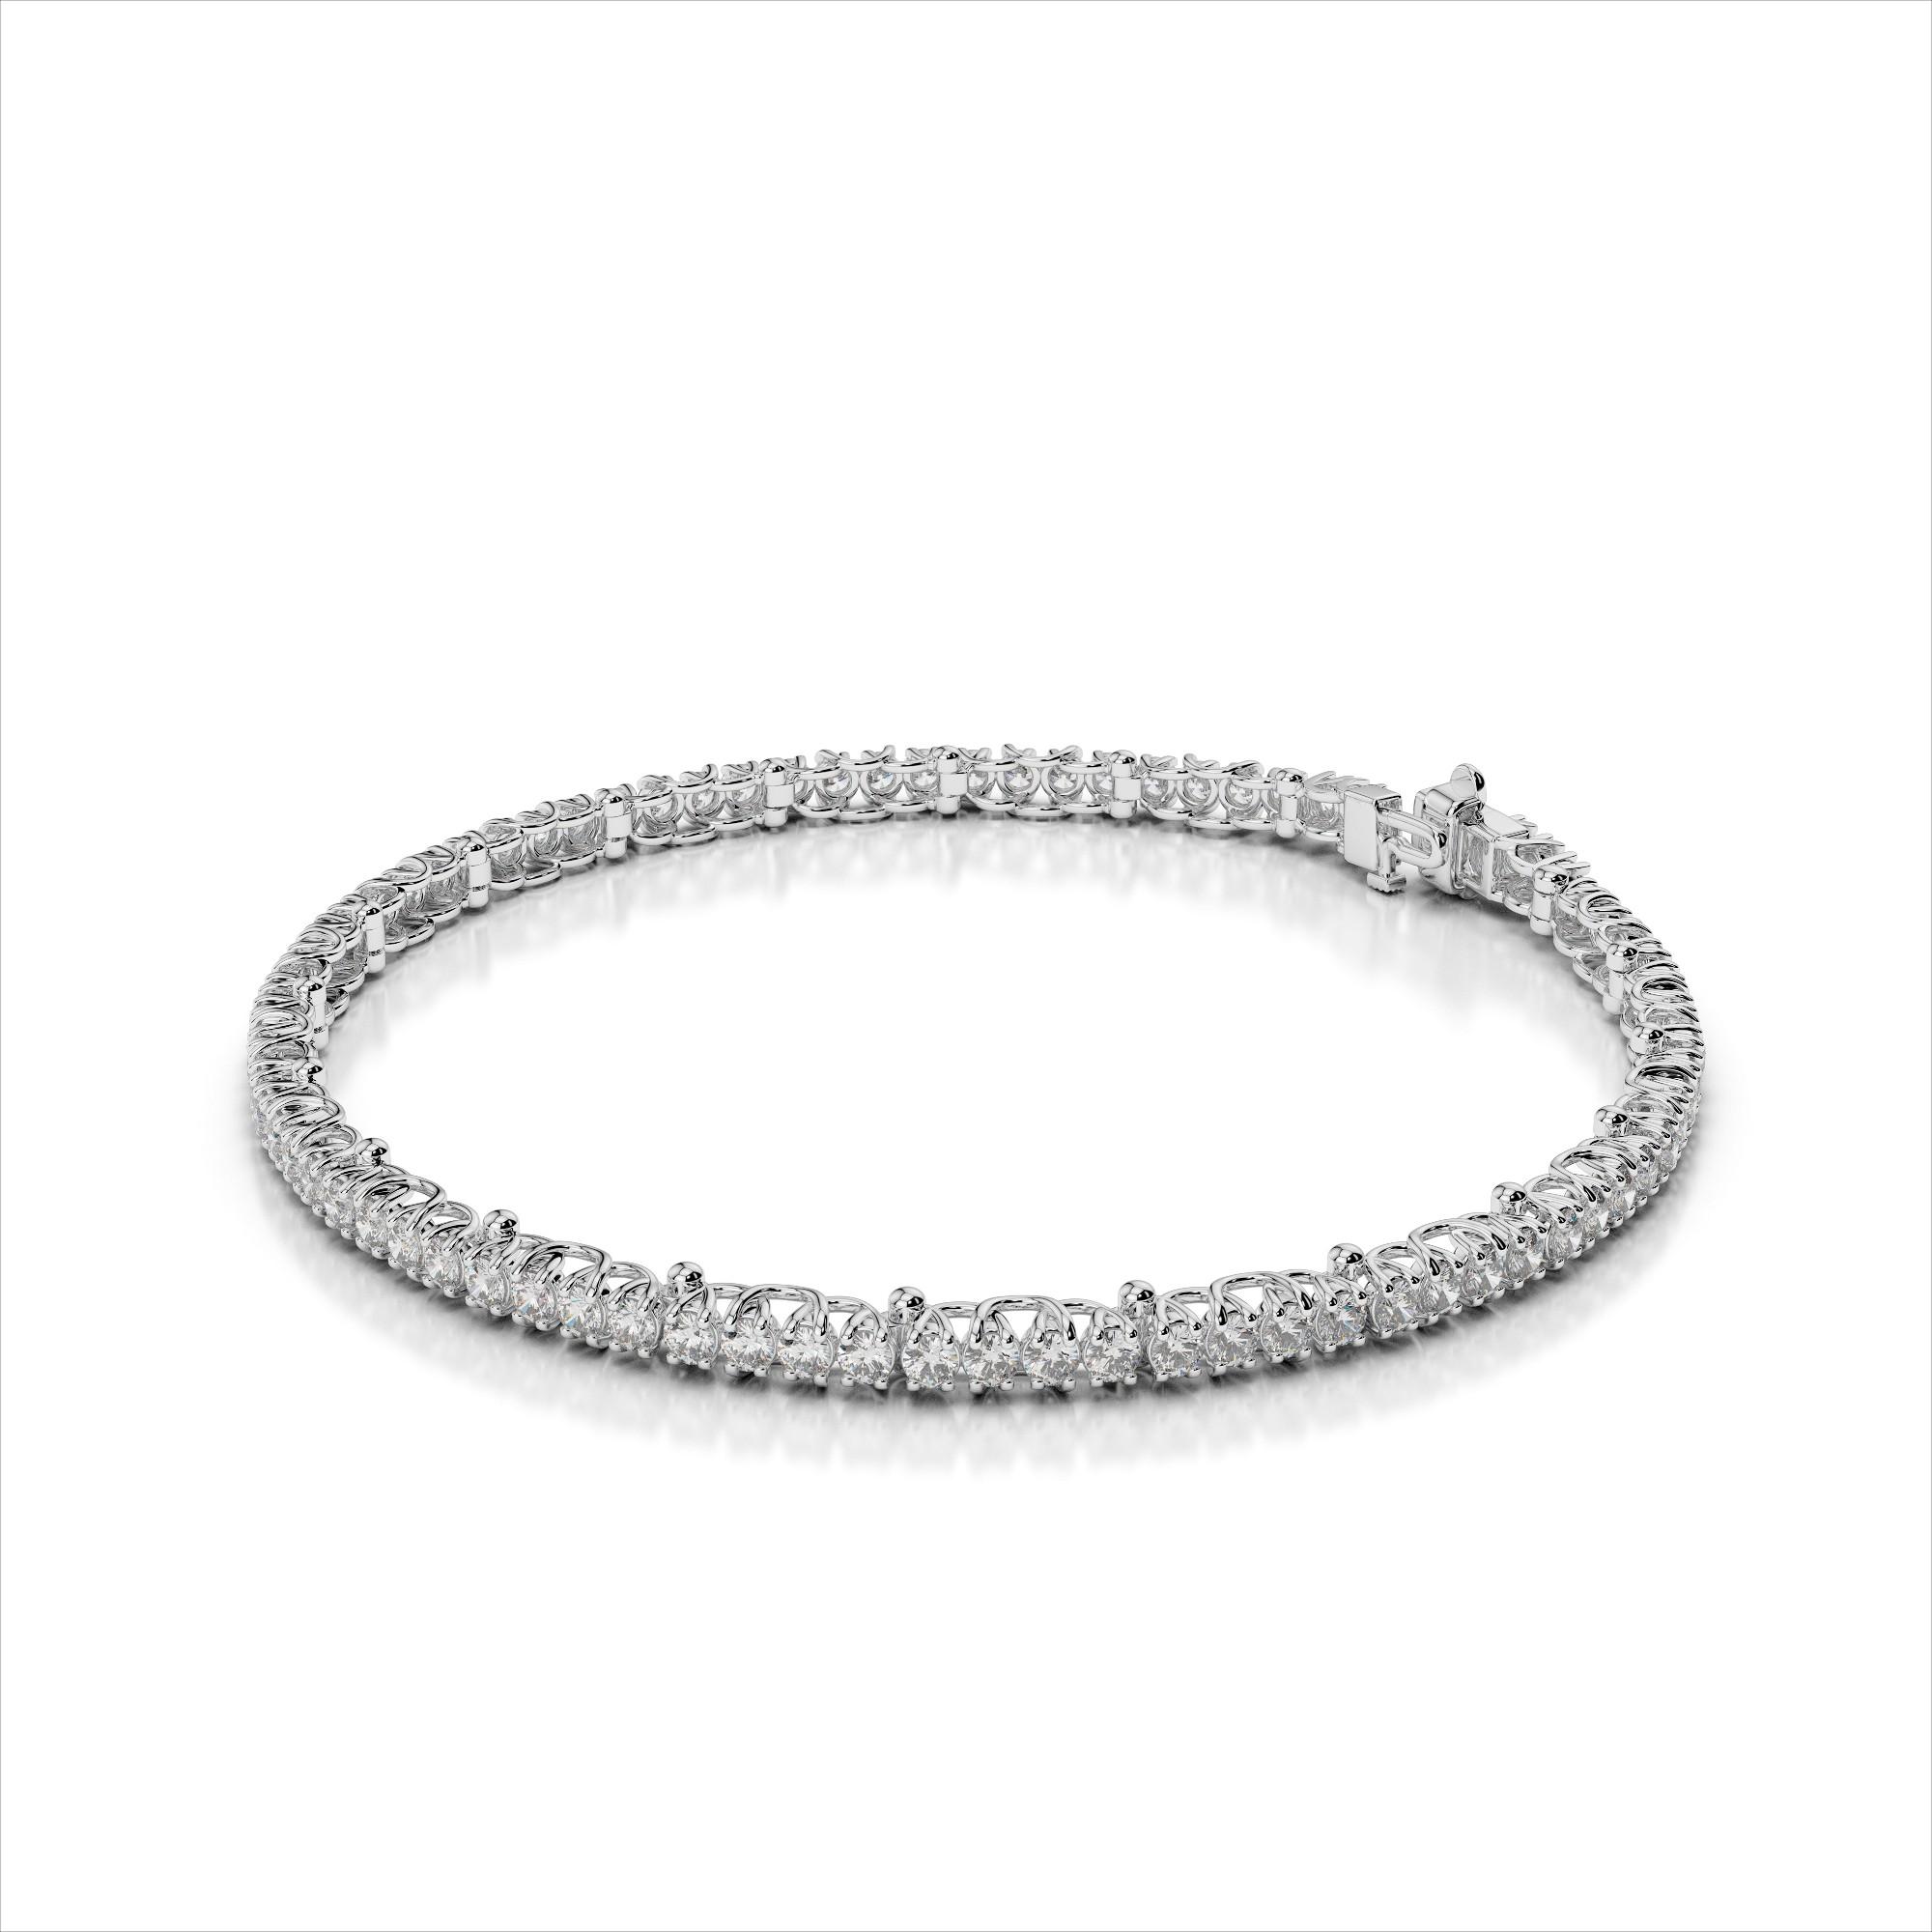 Diamond Bracelet with Trellis Shaped Prongs